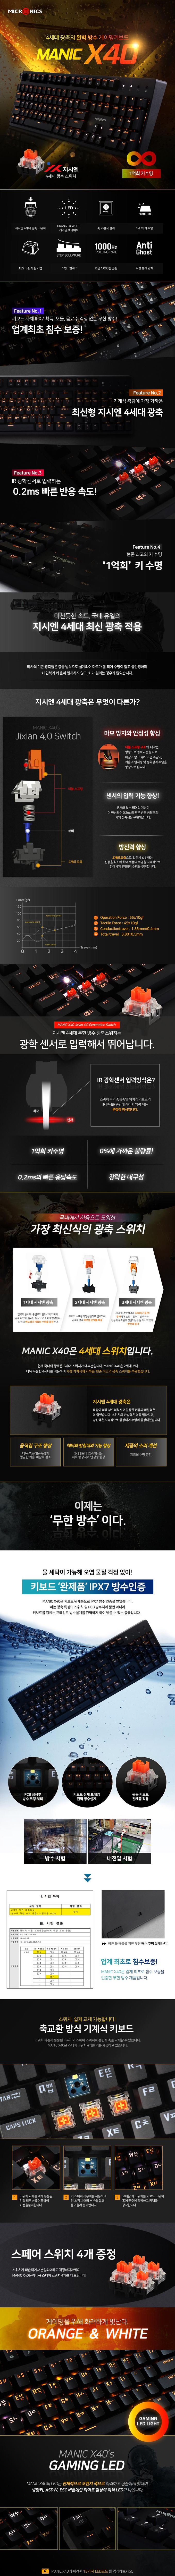 MANIC-X40-1.jpg